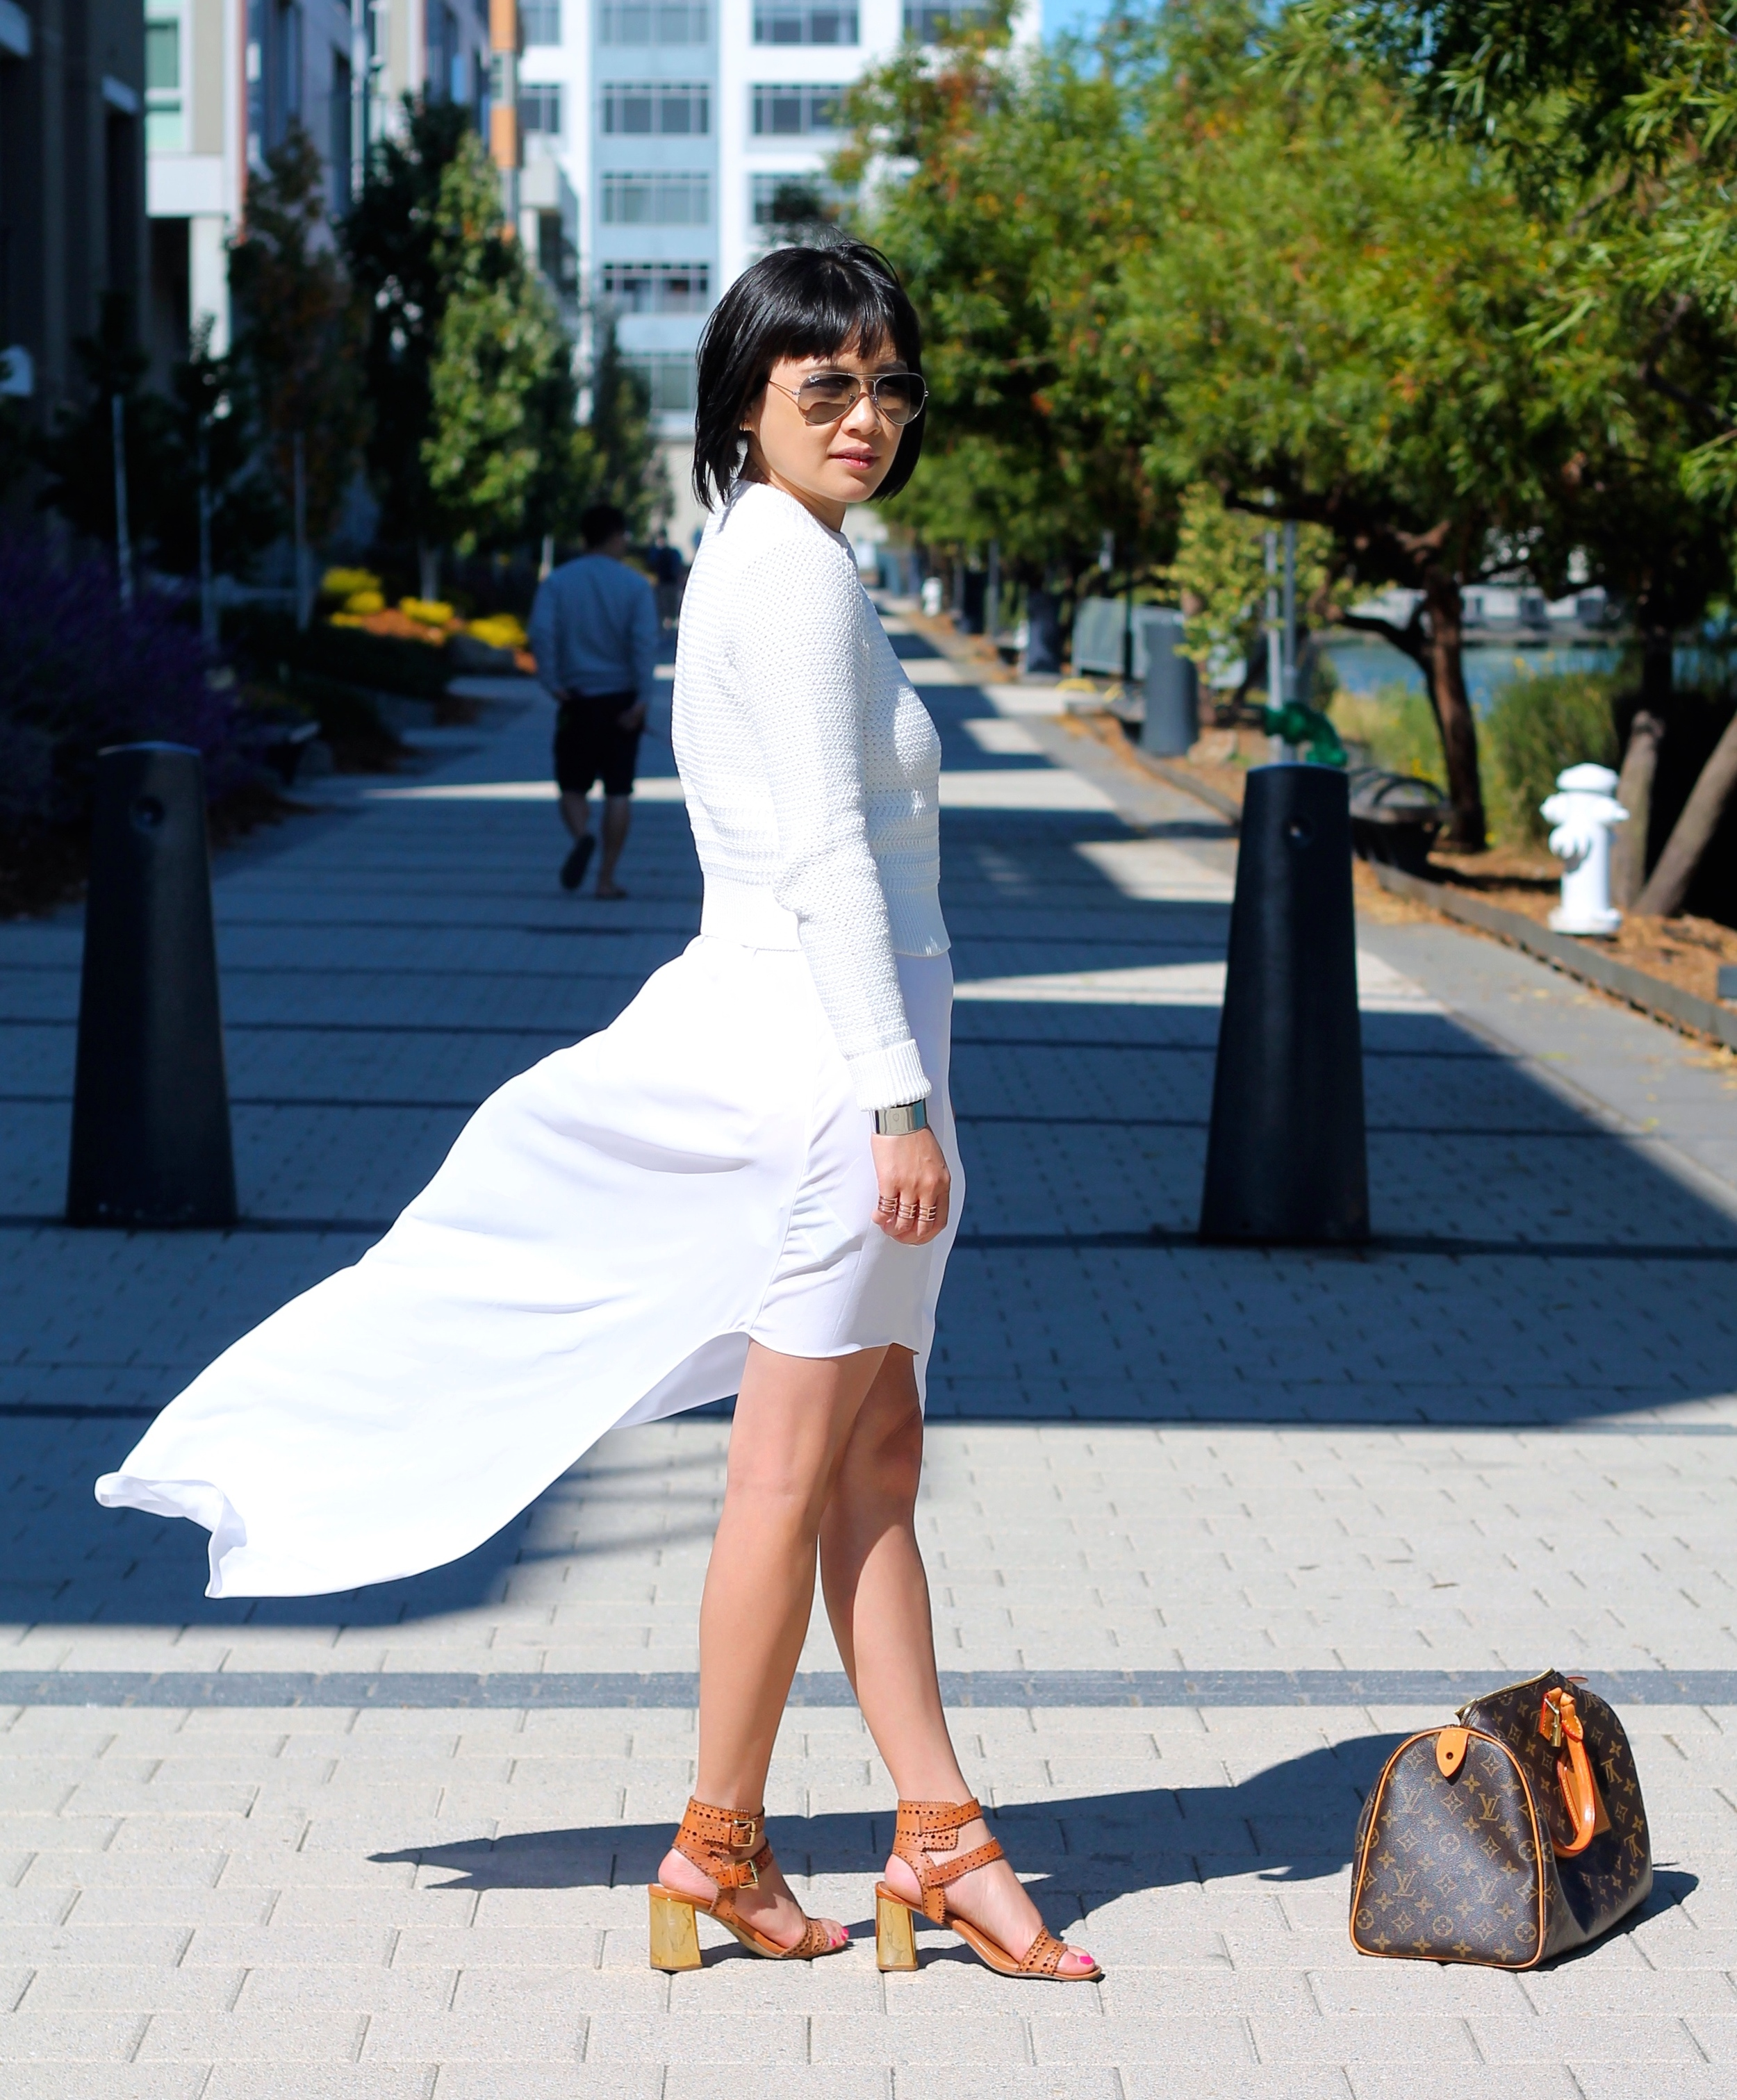 Club Monaco sweater, BCBG dress, Dolce Vita shoes, Ray-Ban sunglasses, Louis Vuitton bag